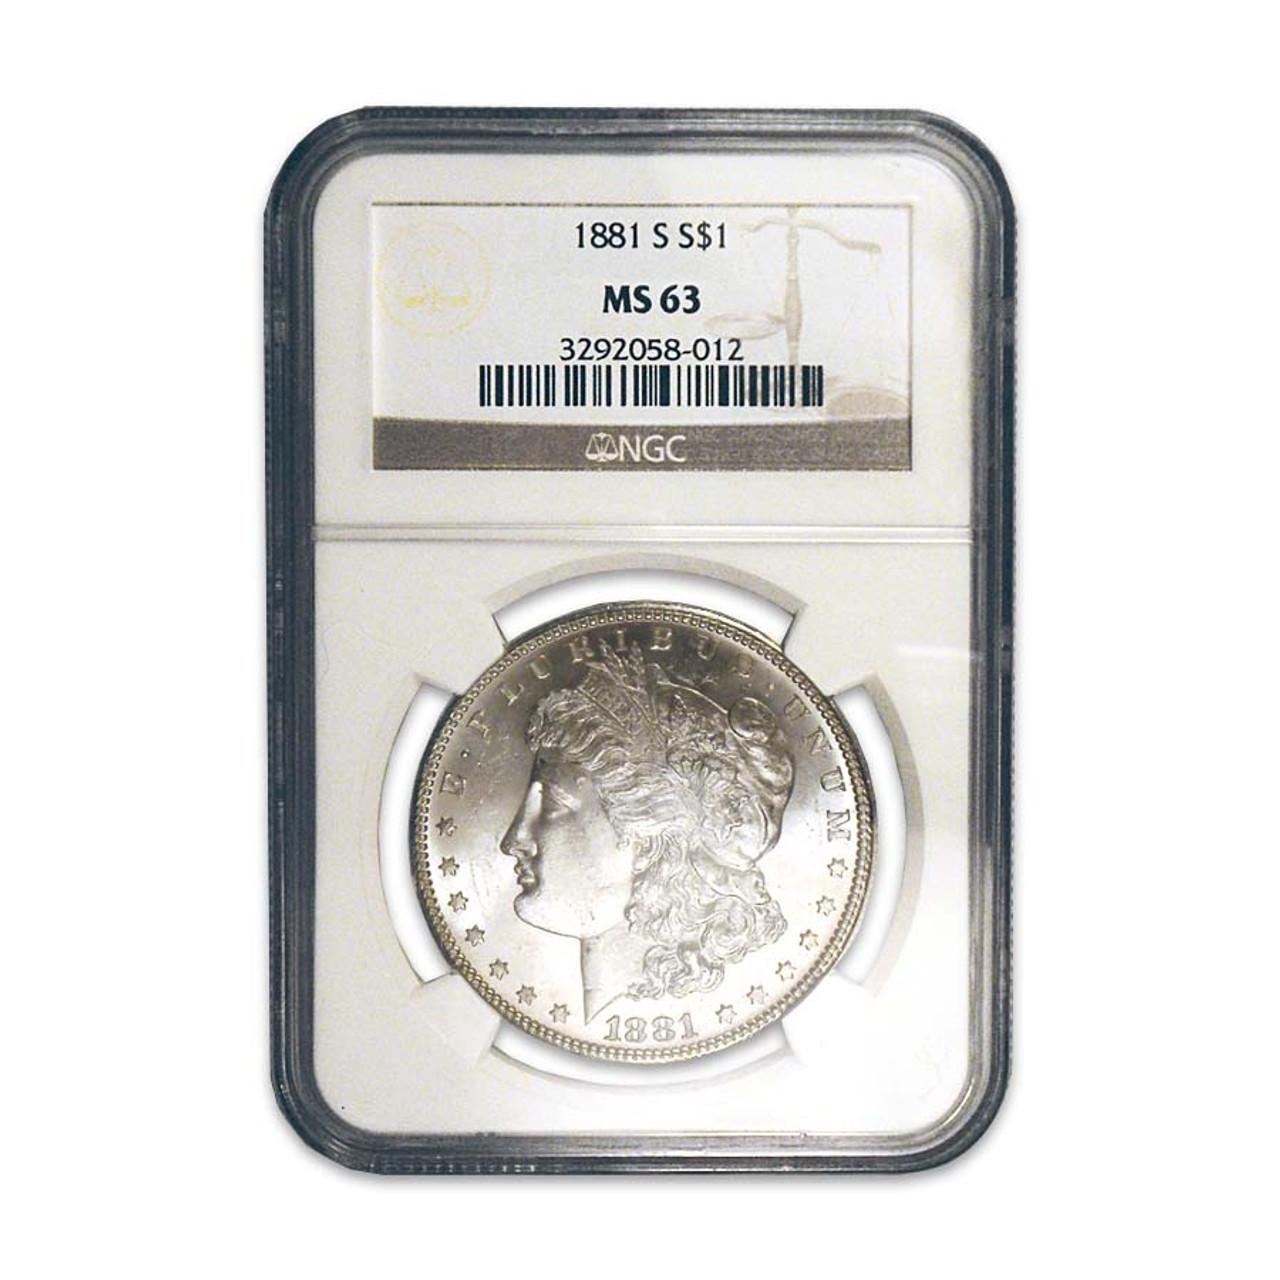 1881-S Morgan Silver Dollar Certified MS-63 Image 1